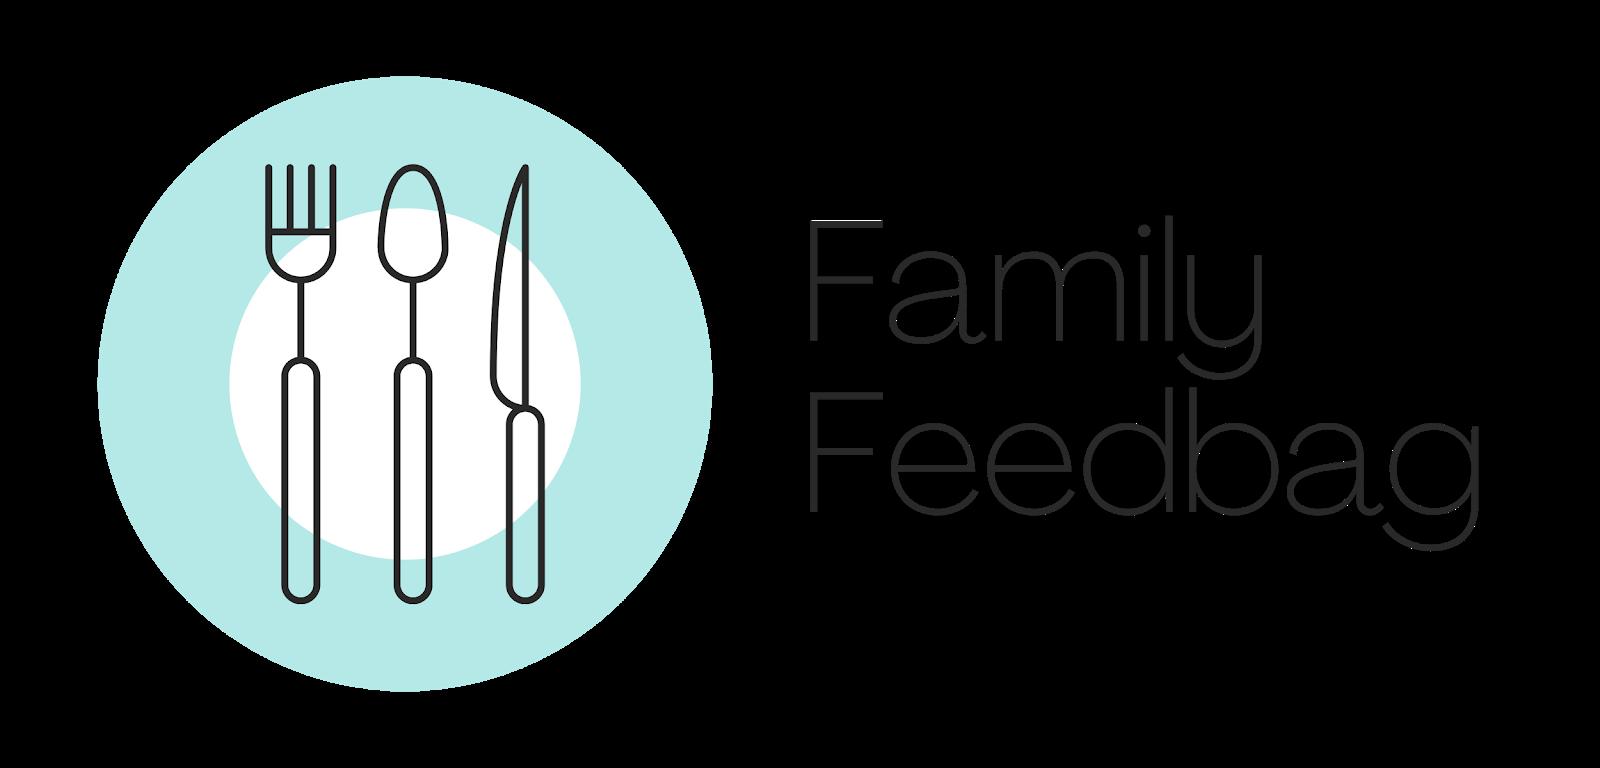 Family Feedbag